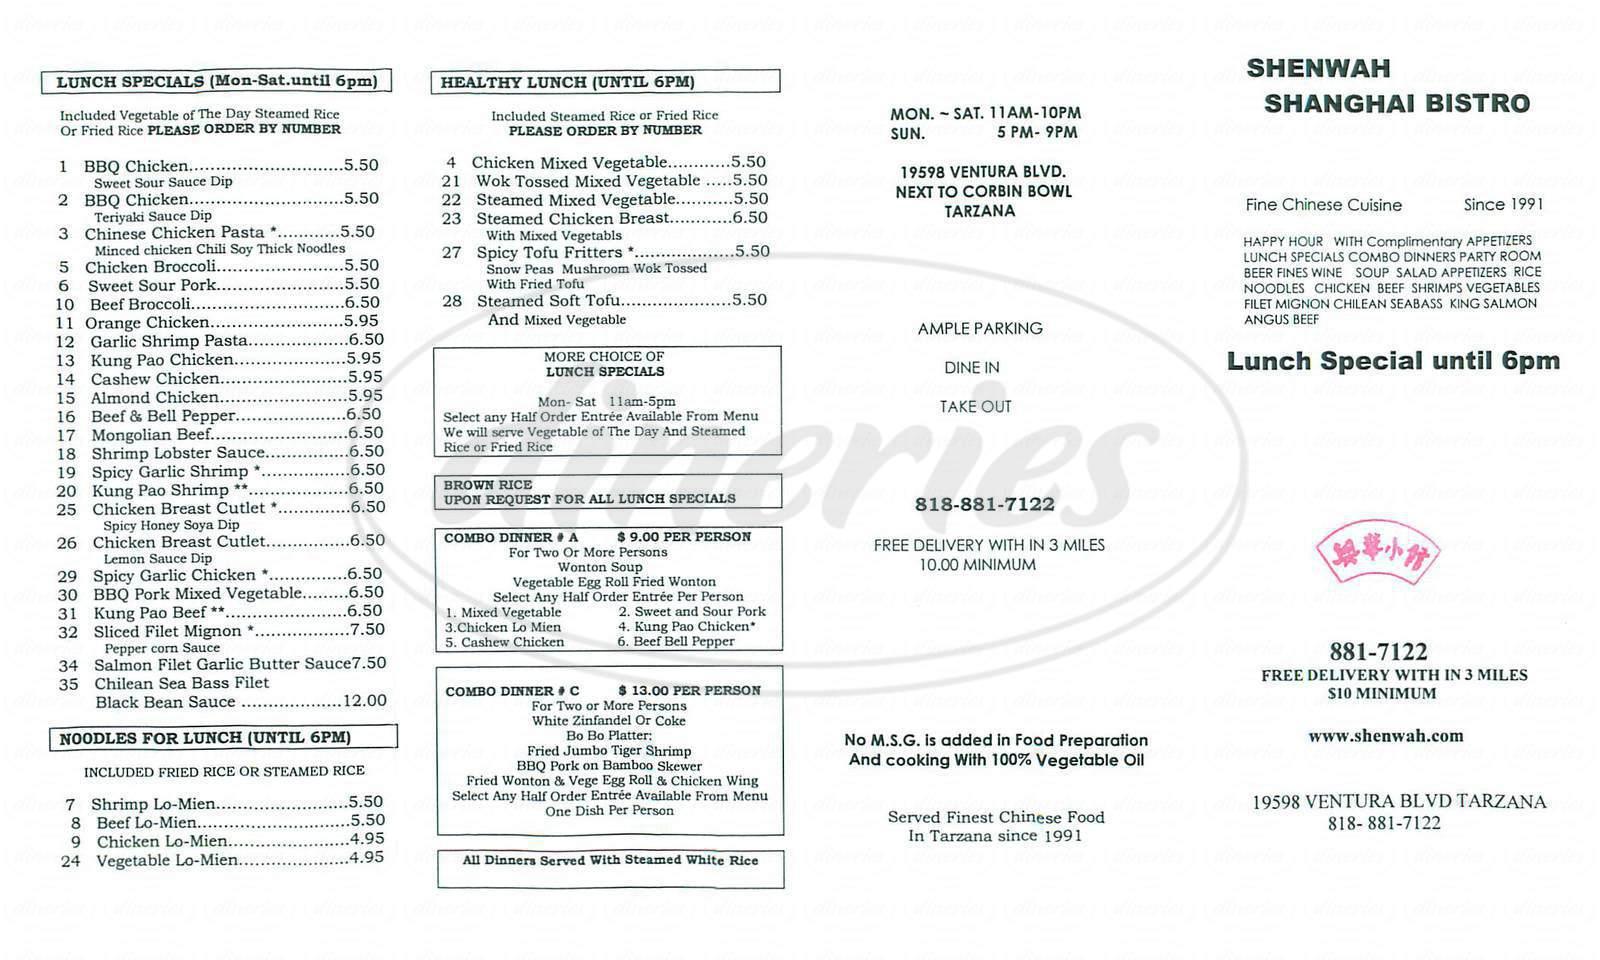 menu for Shenwah Shanghai Bistro